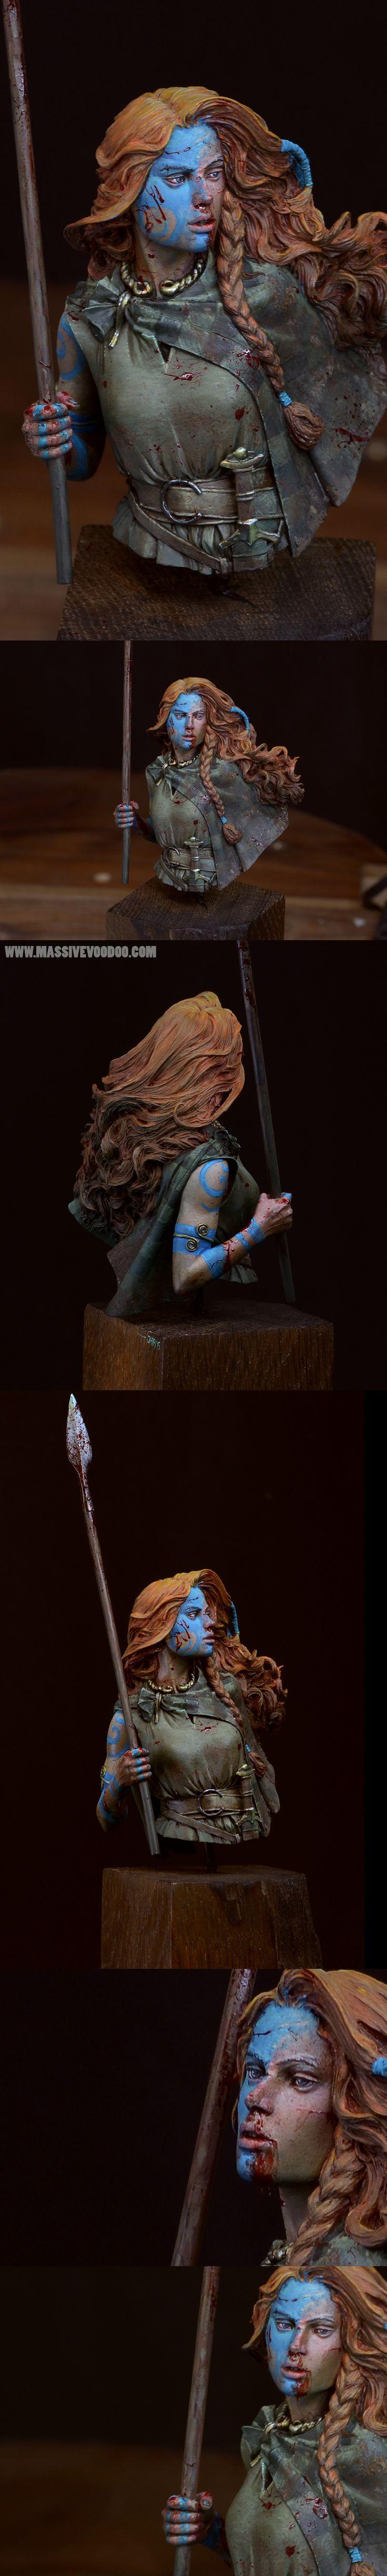 Boudica, Battle of Watling Street